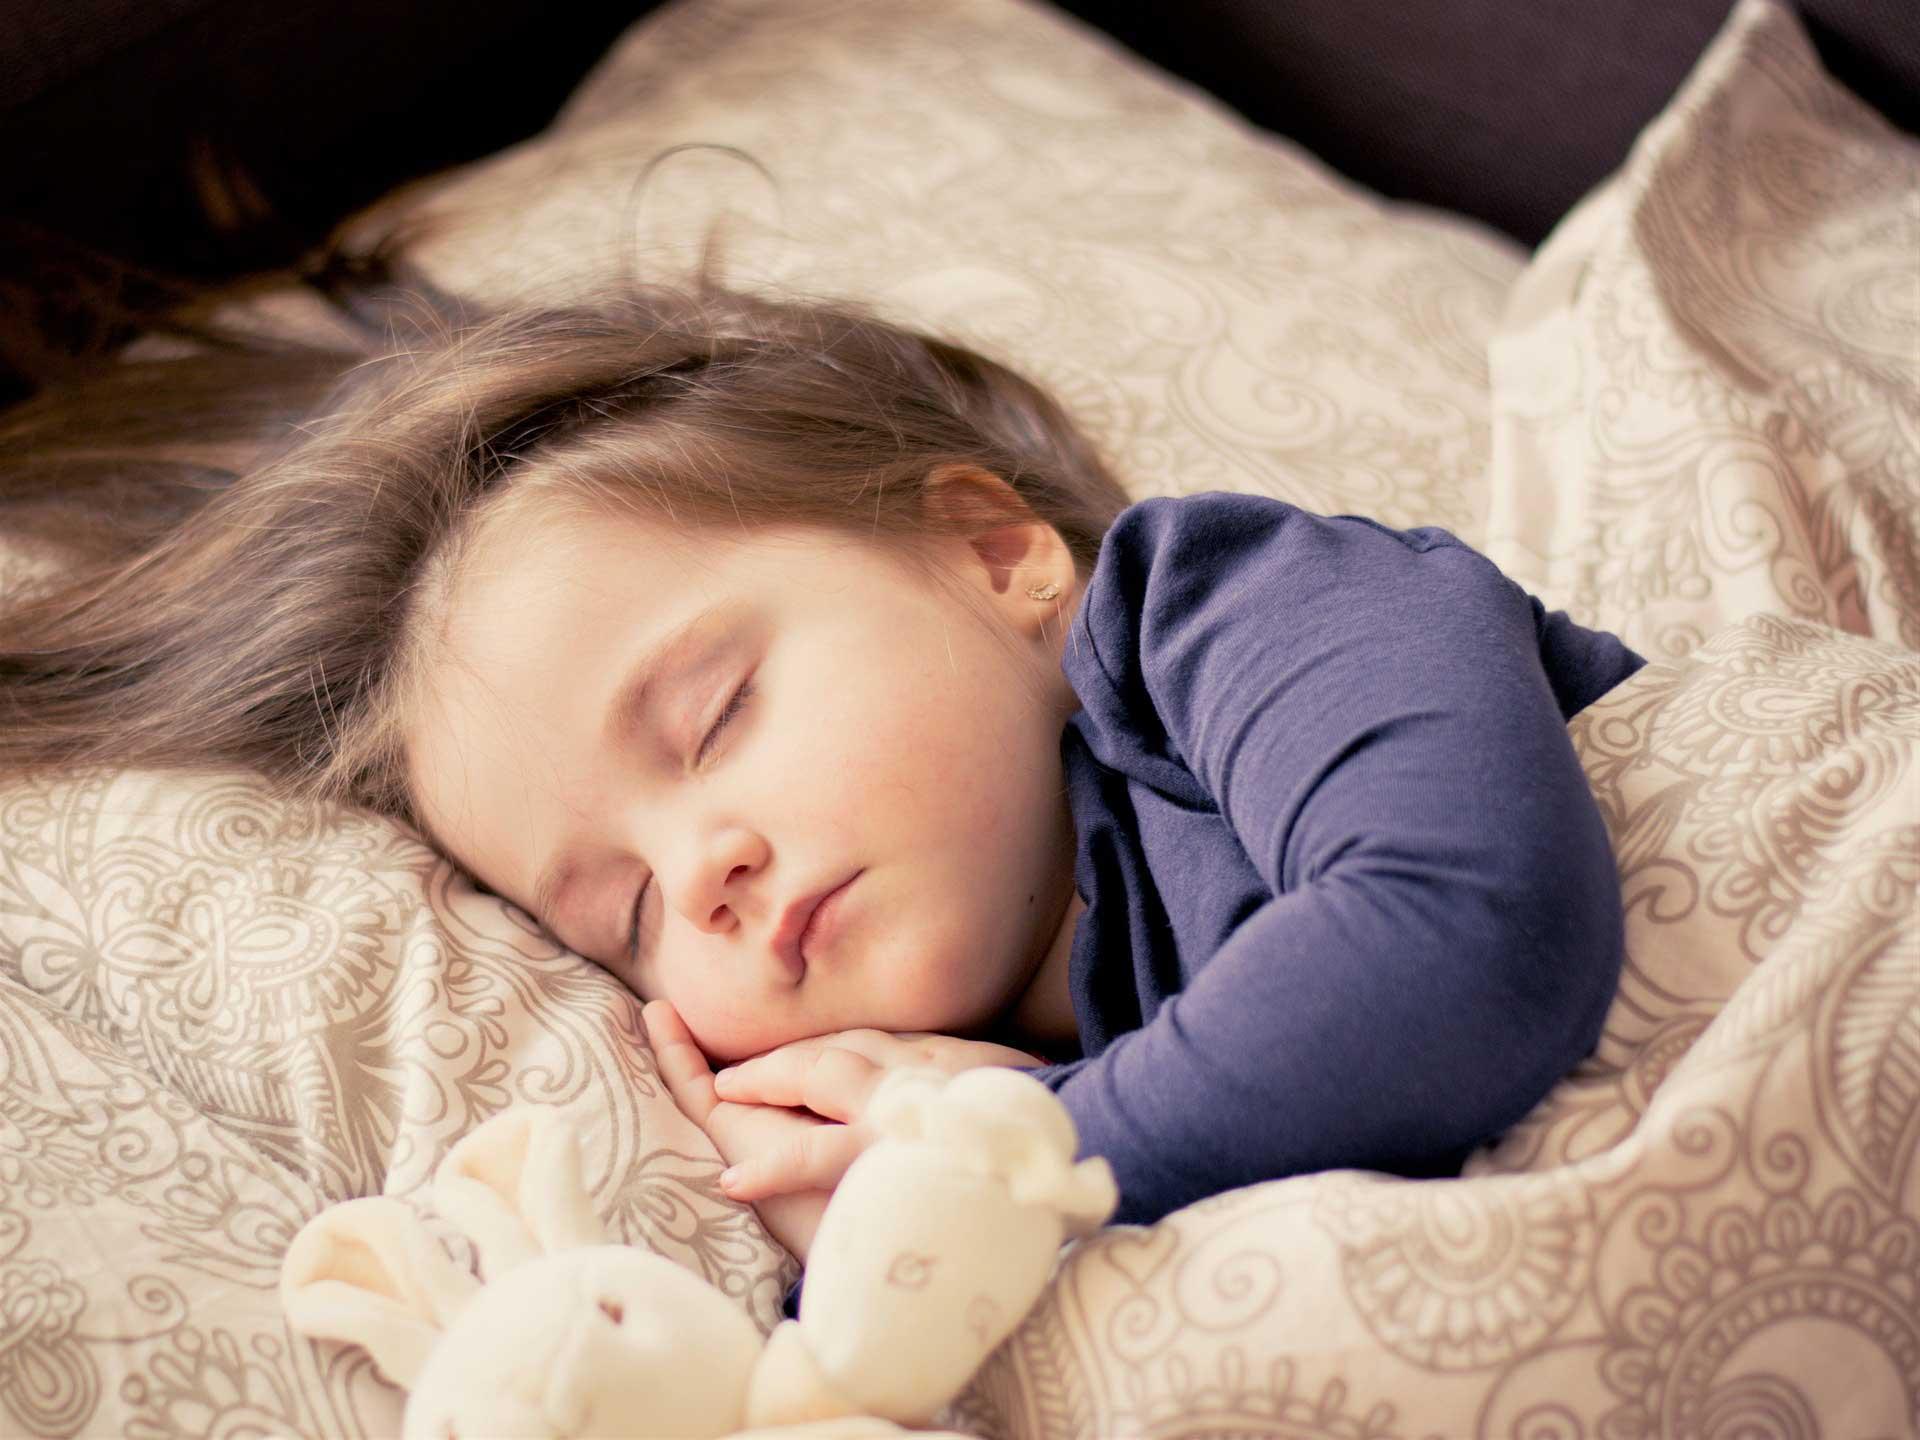 Child-Sleeping-With-Stuffed-Animal.jpg